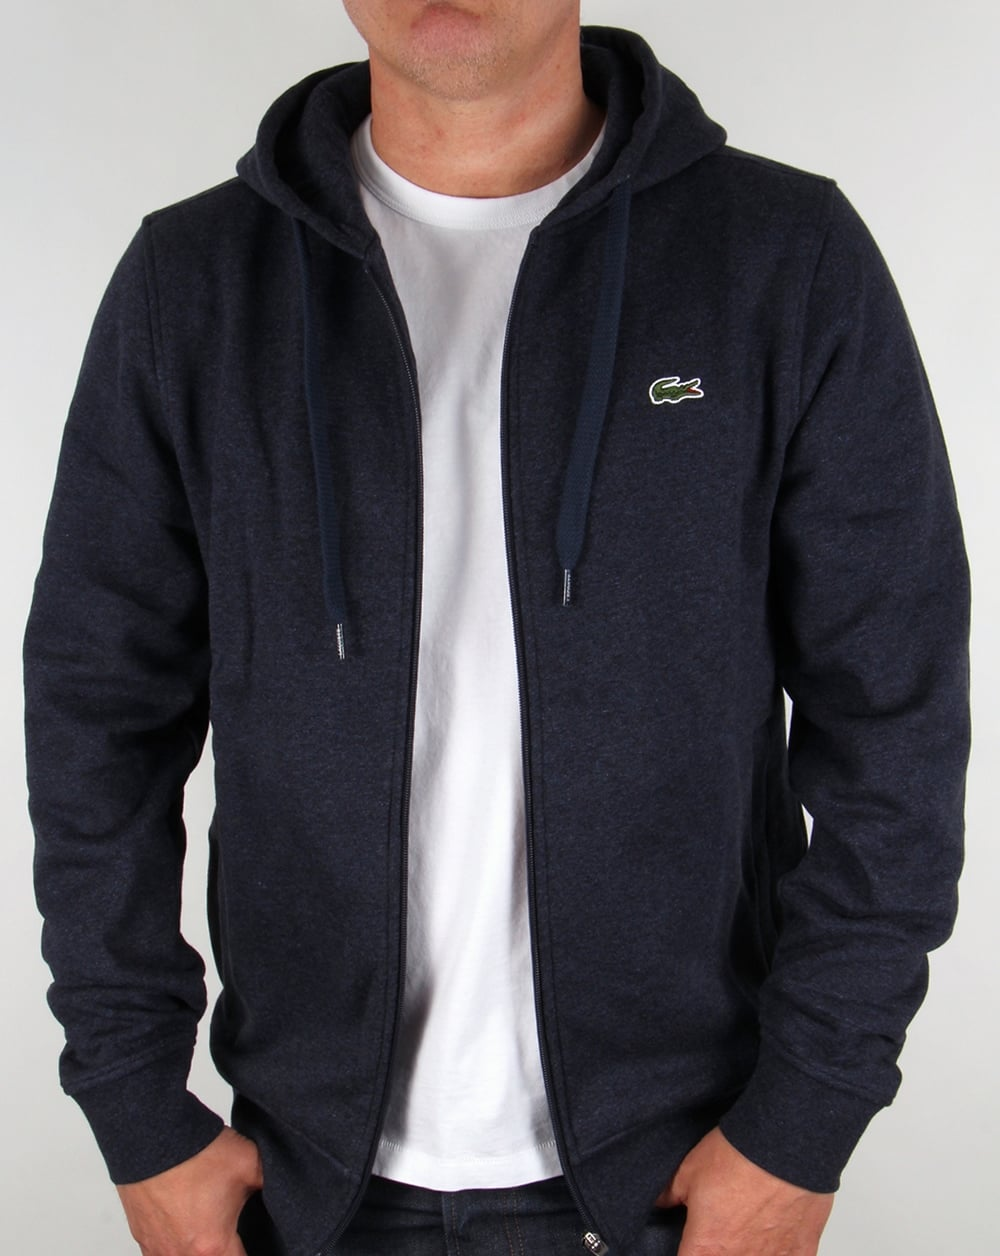 959f3b2370ea Lacoste Hooded Full Zip Sweatshirt Navy Marl